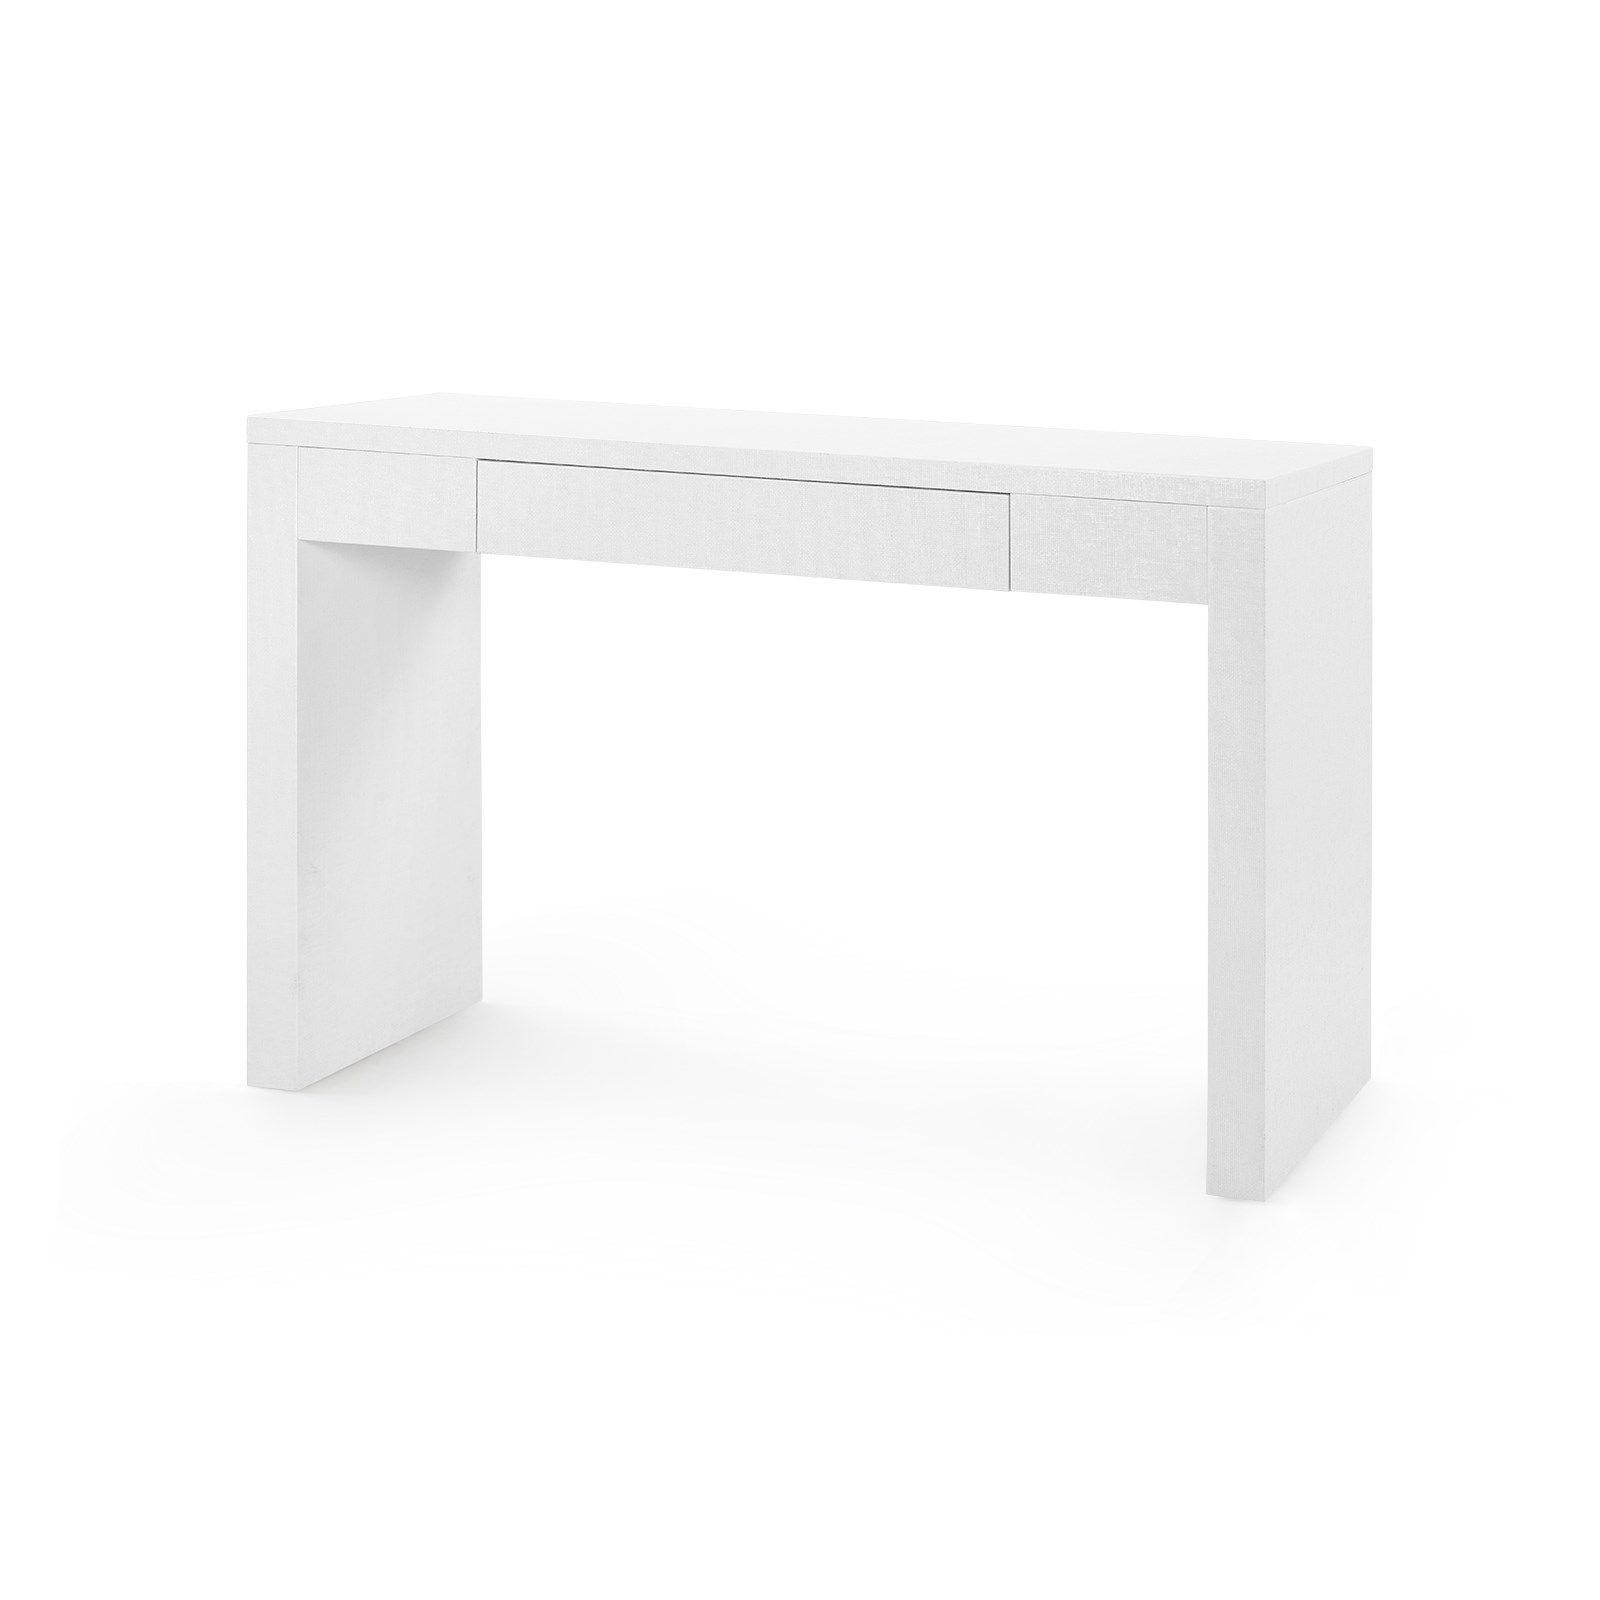 Morgan Console White In 2021 Grasscloth Console Table Home